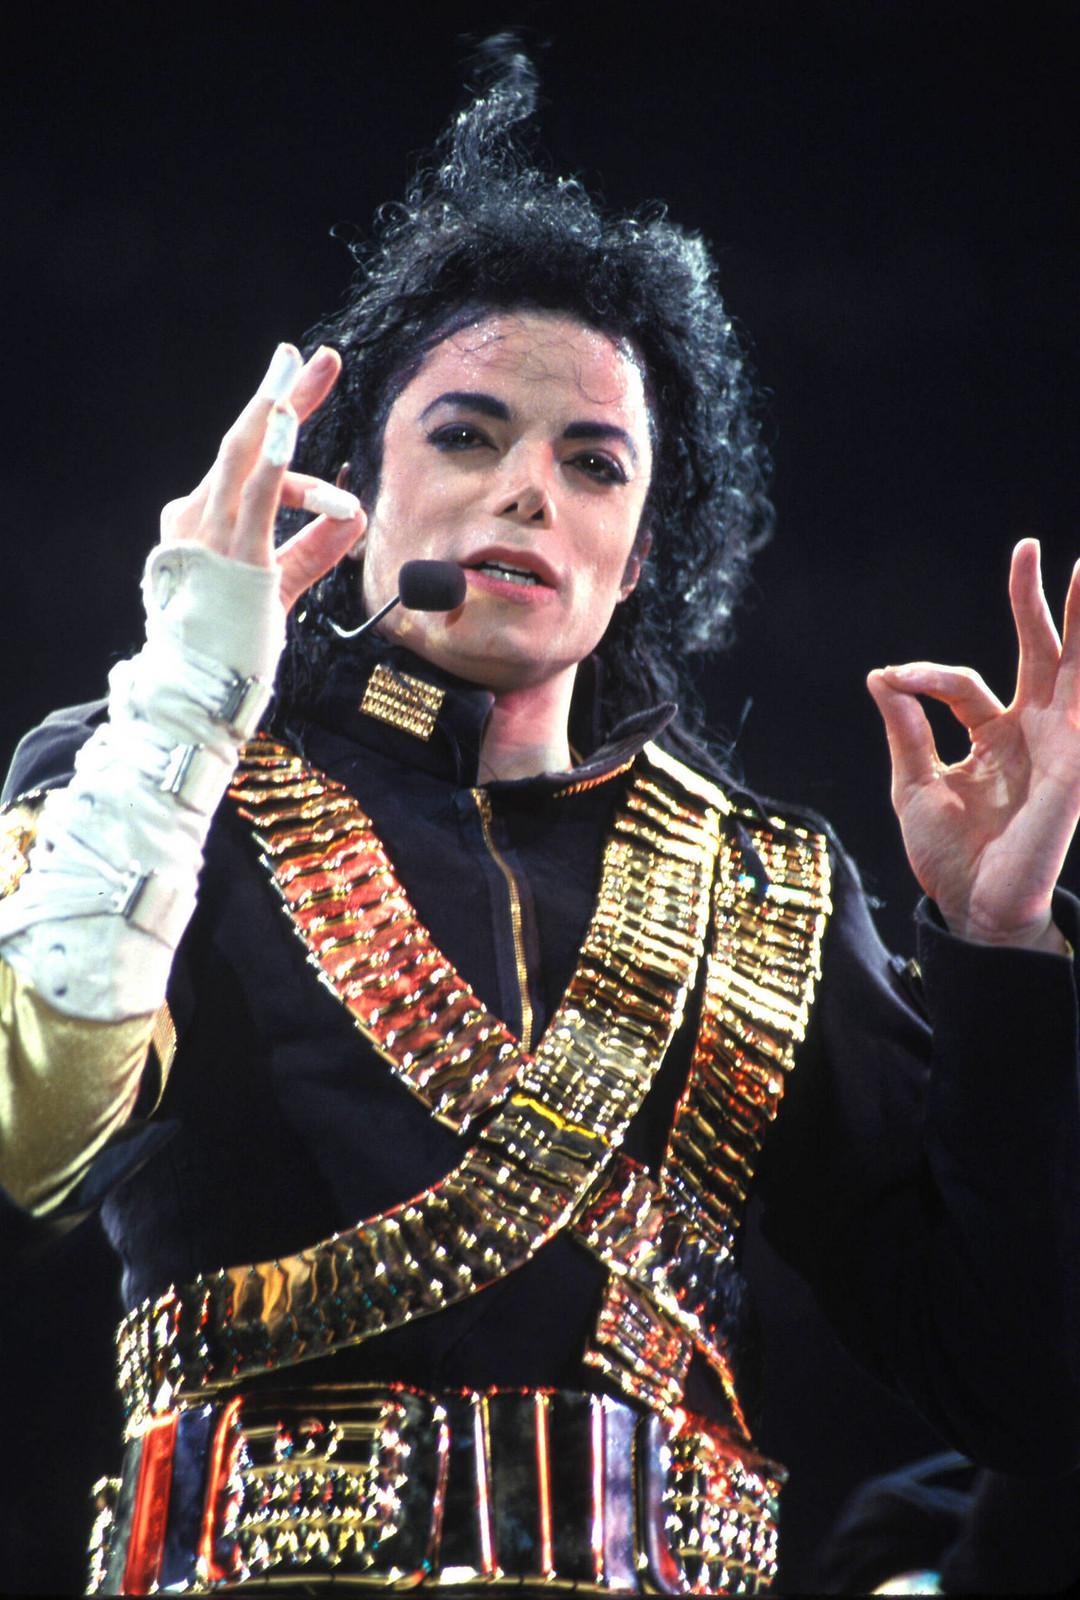 Незабываемый образ Майкла Джексона